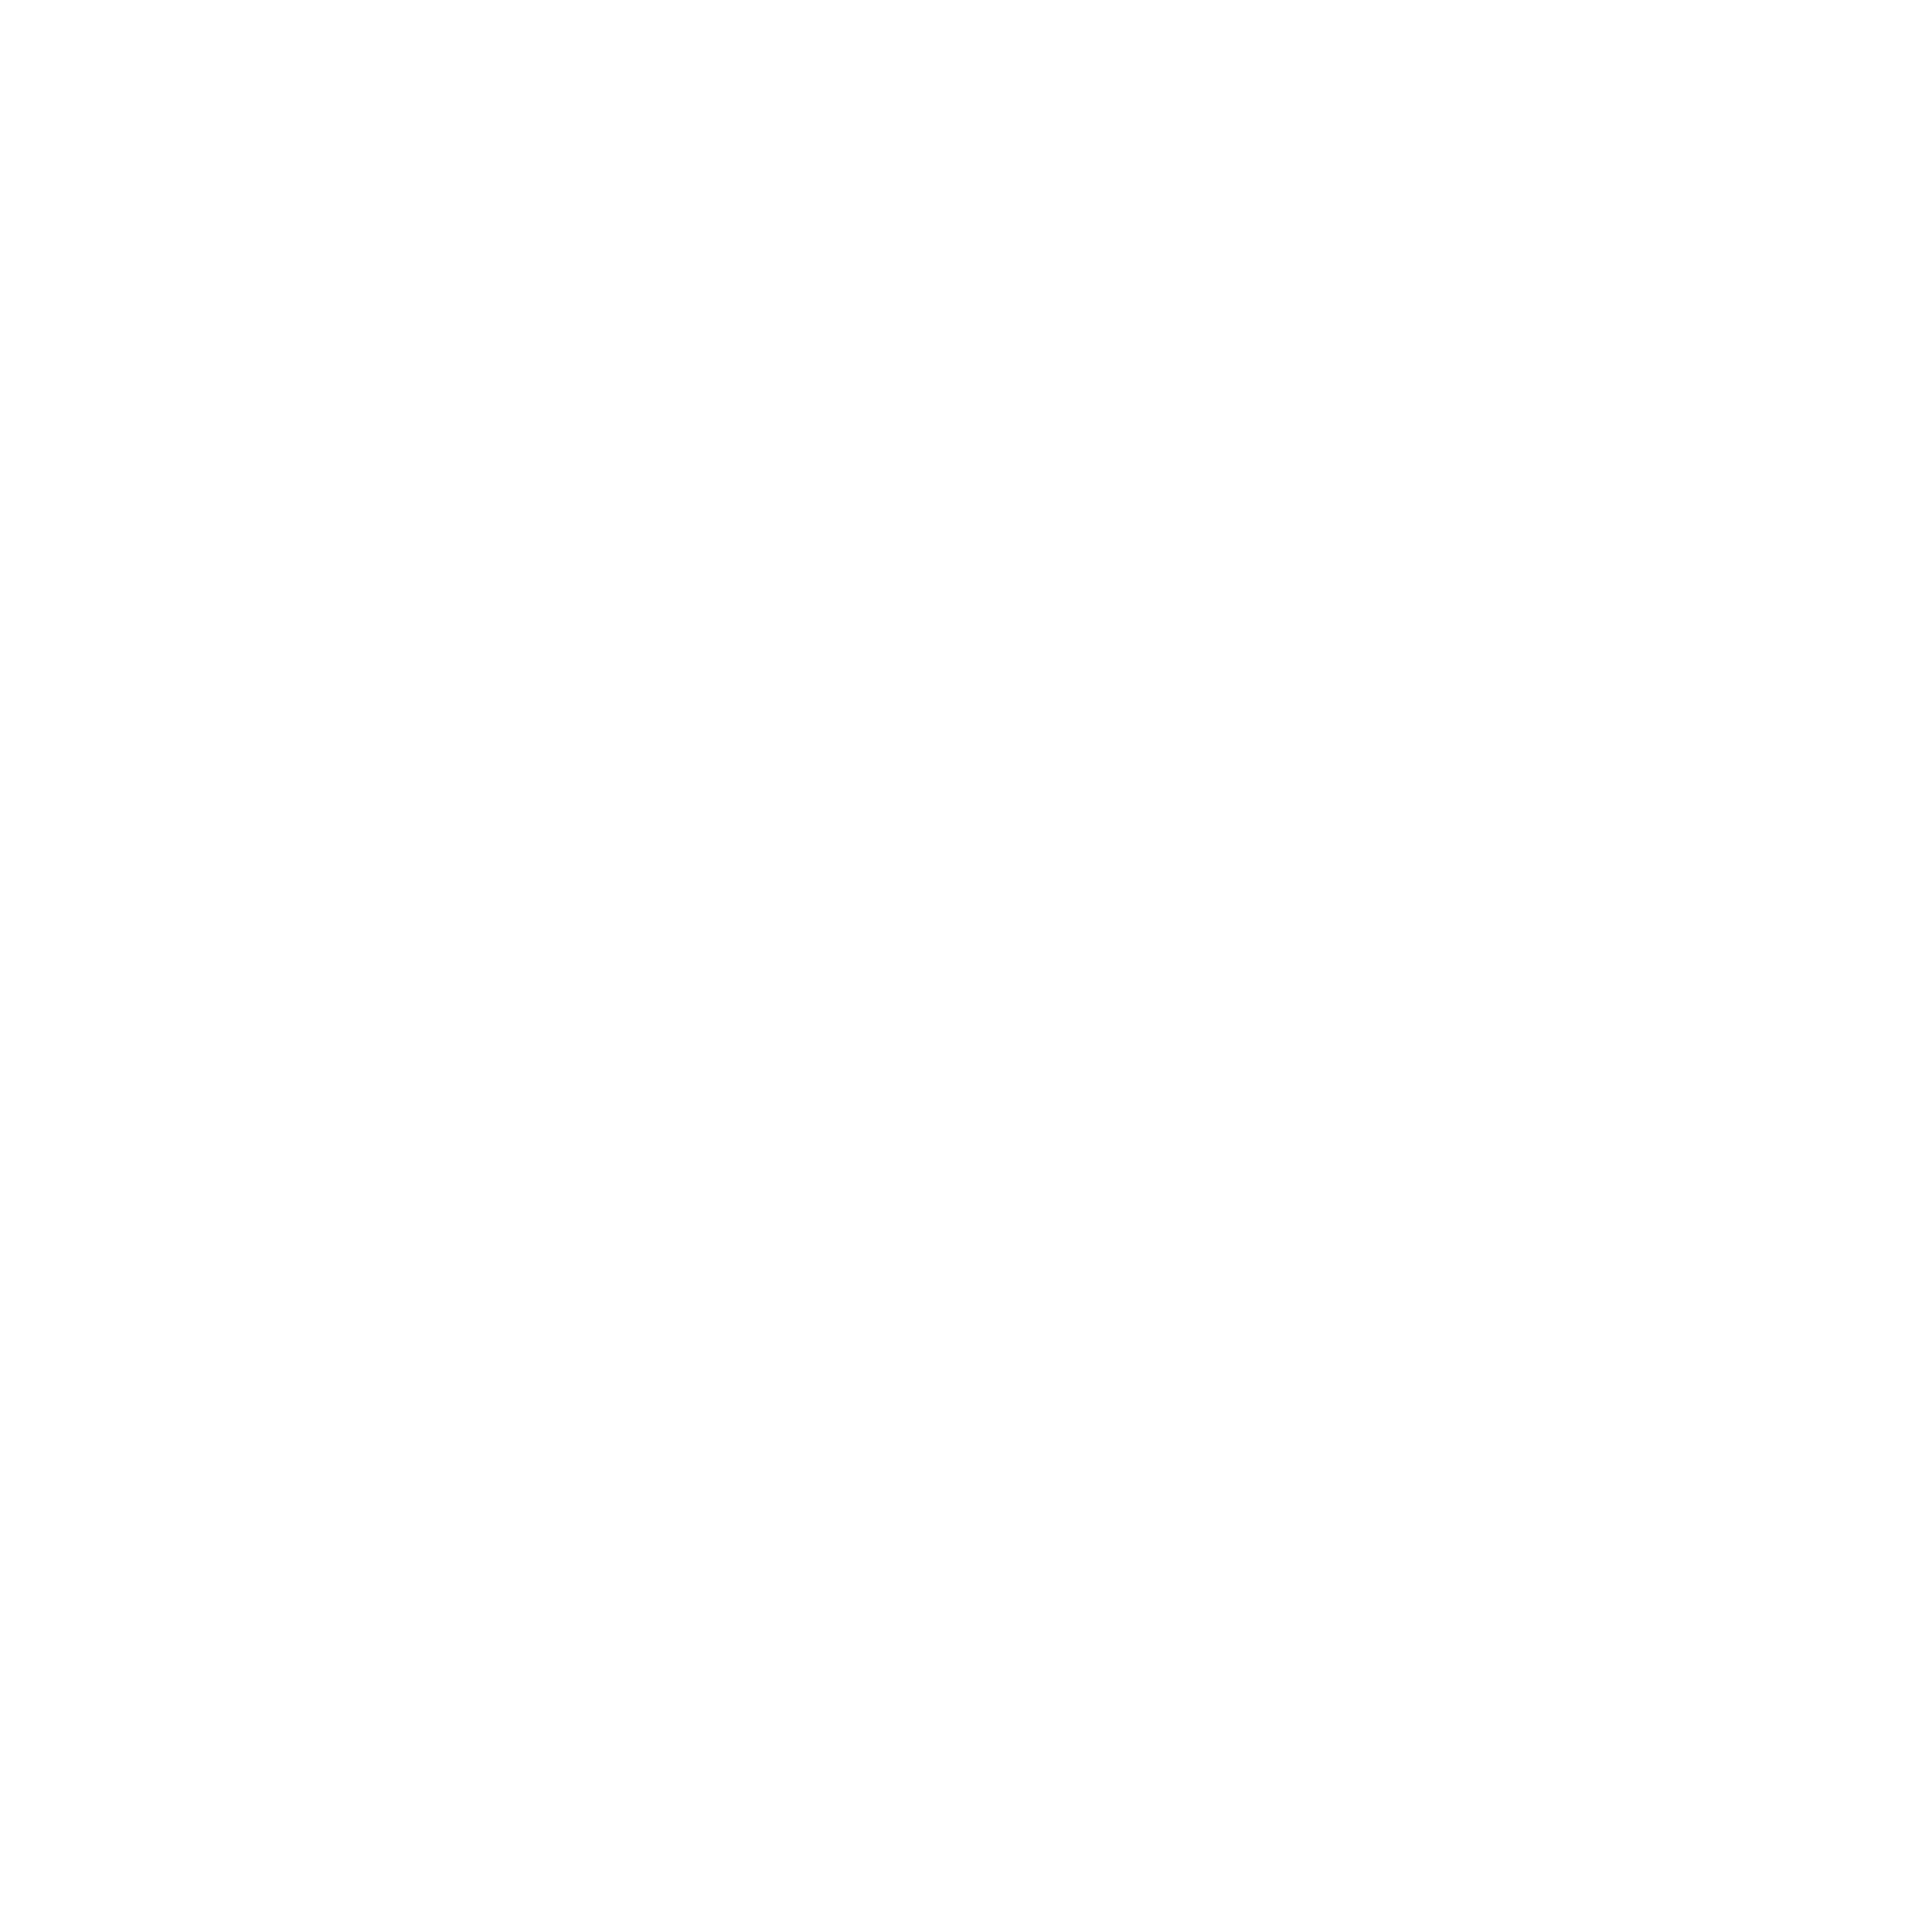 WASTEMORESPACE ITZAROSS